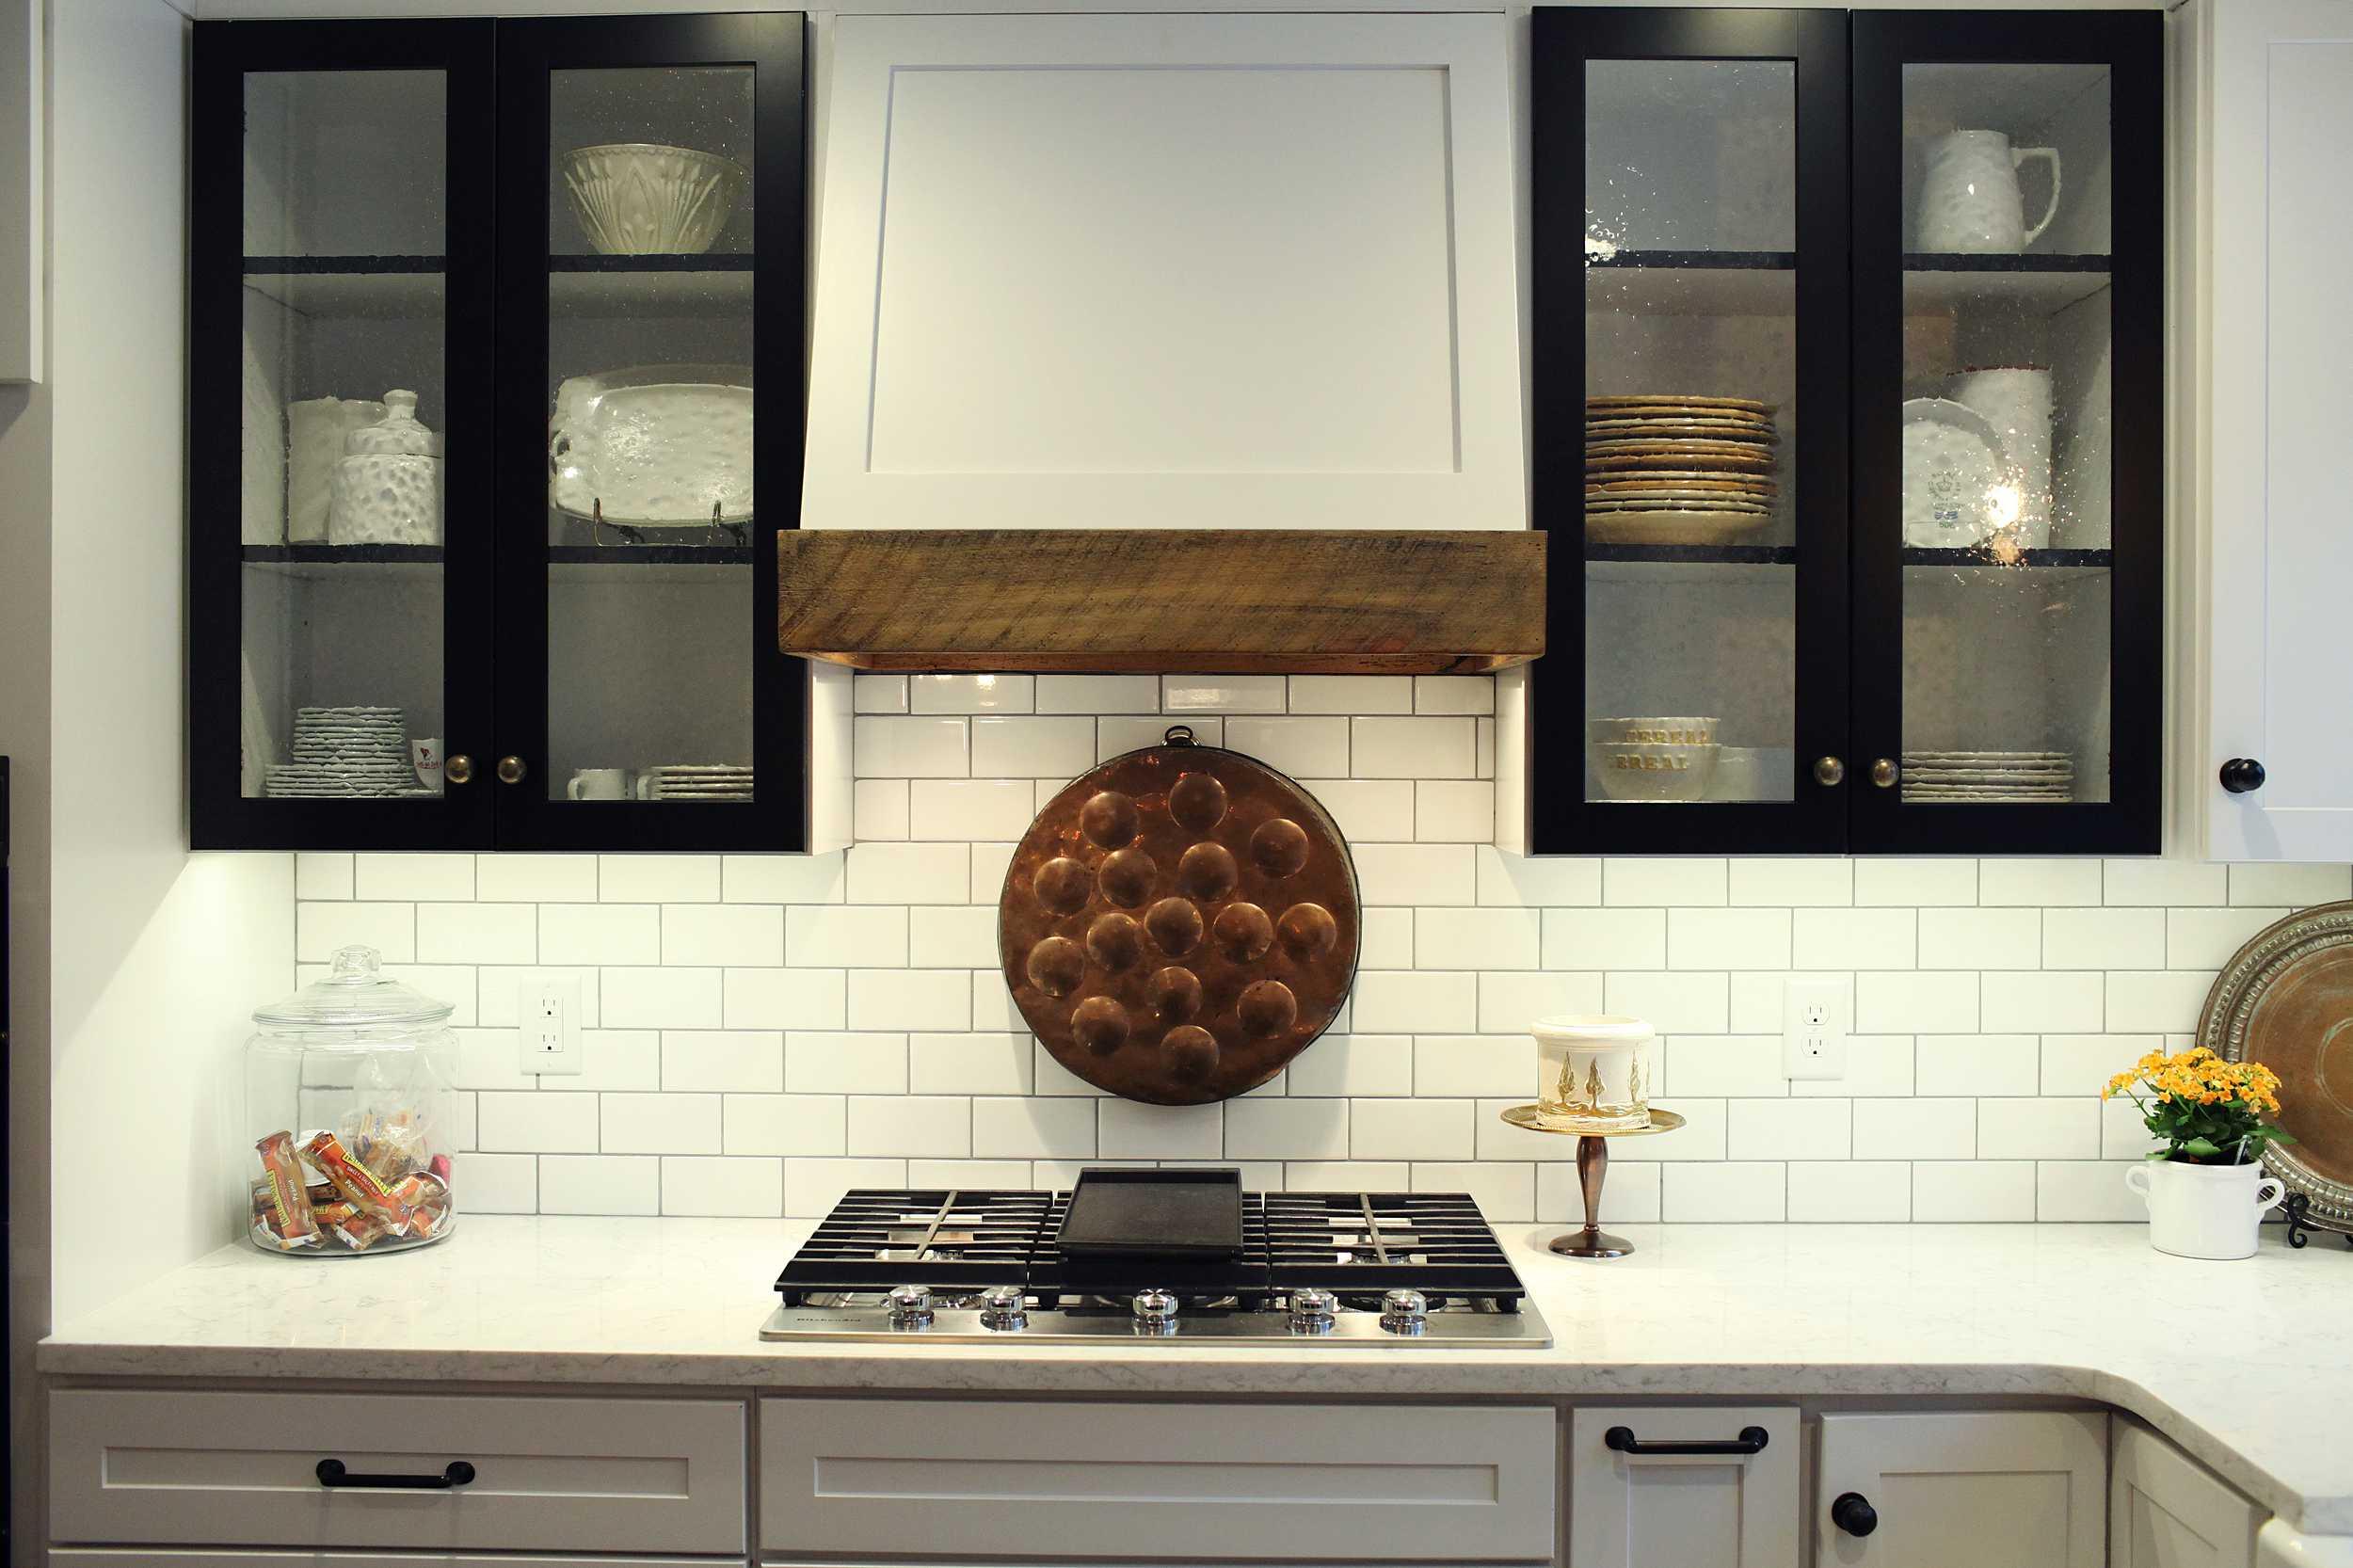 kitchen_remodel (10).jpg